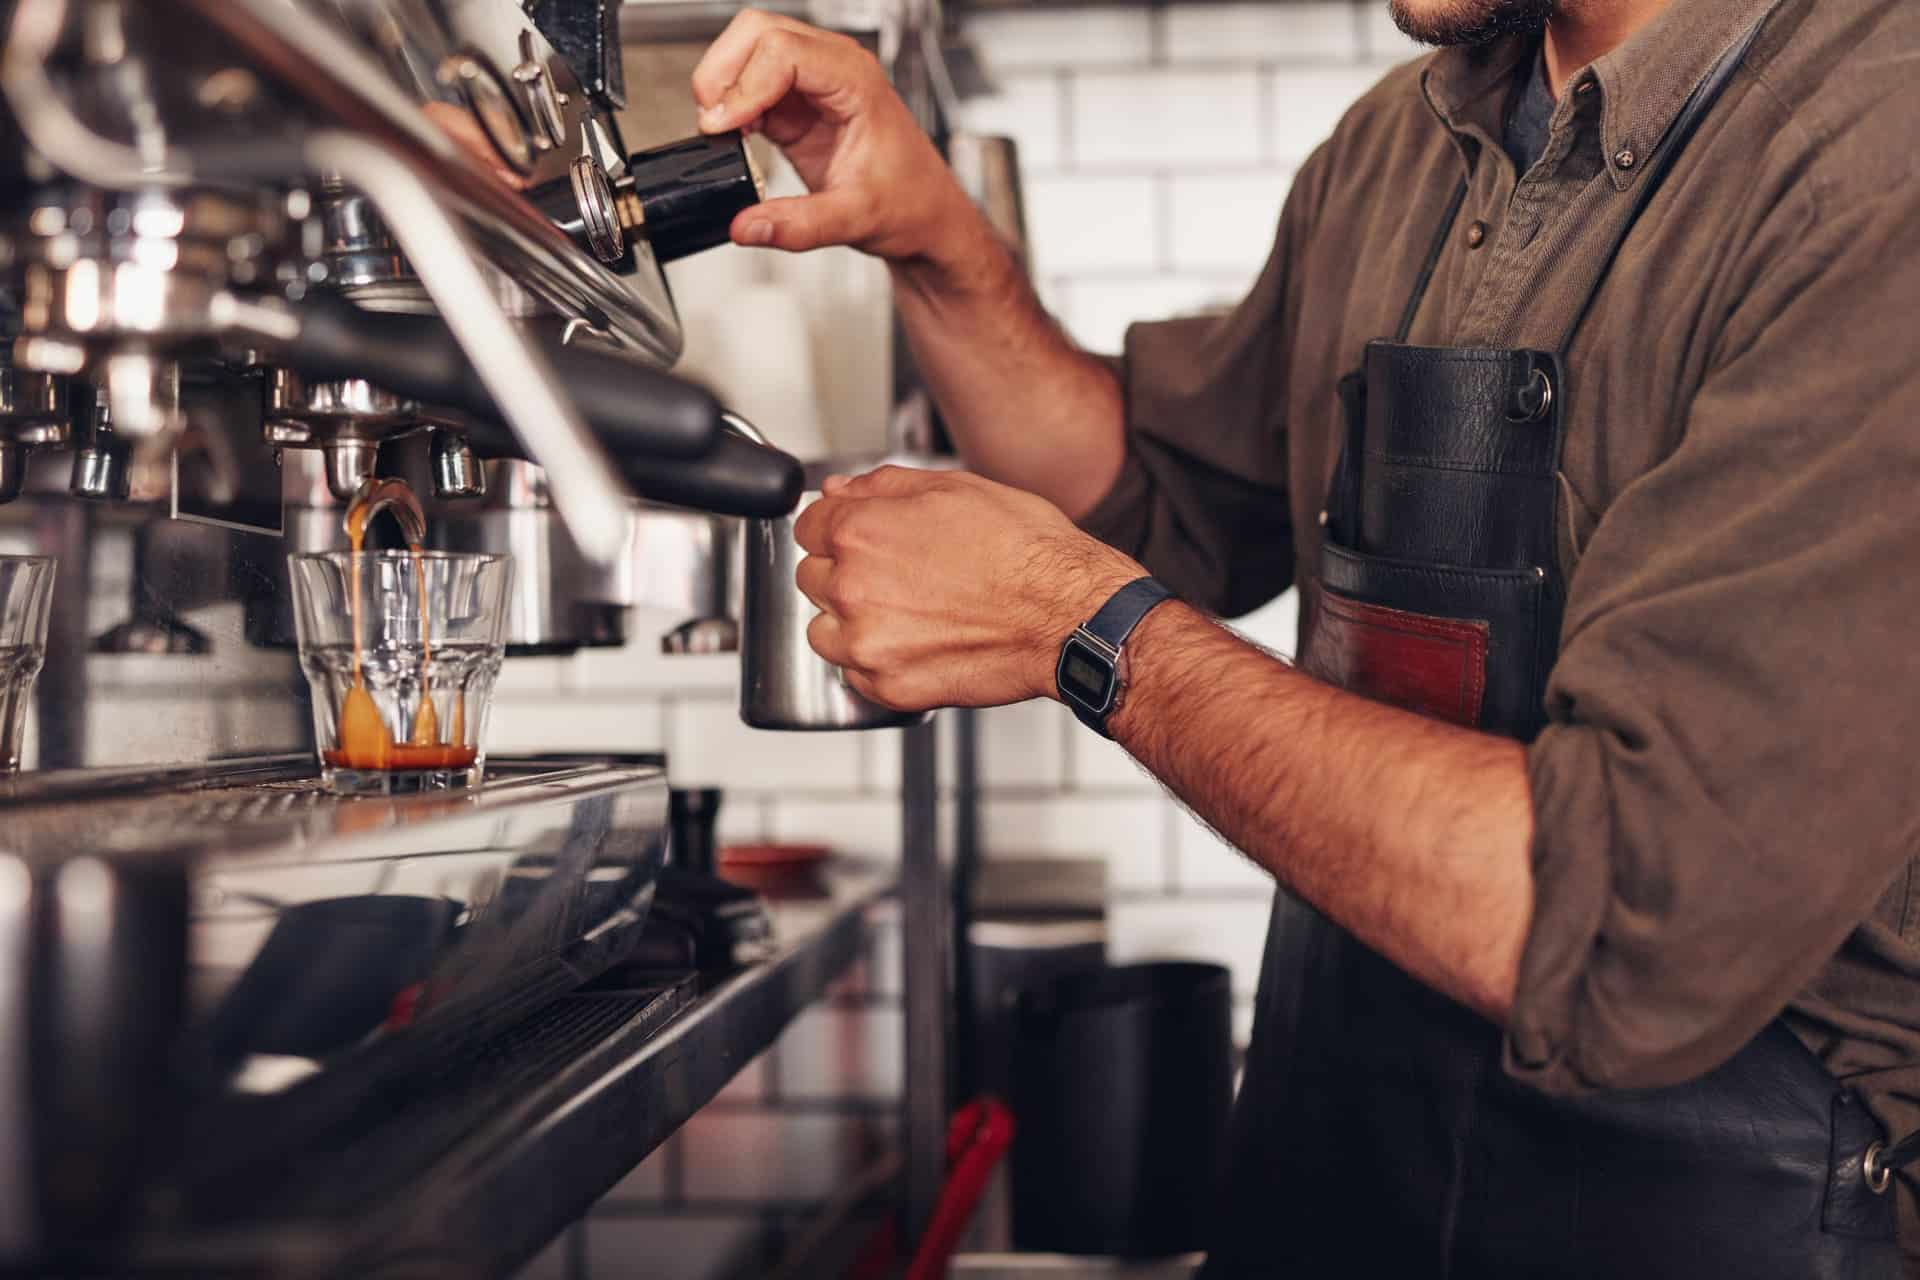 barista-making-coffee-using-a-coffee-maker-PGK3YJF